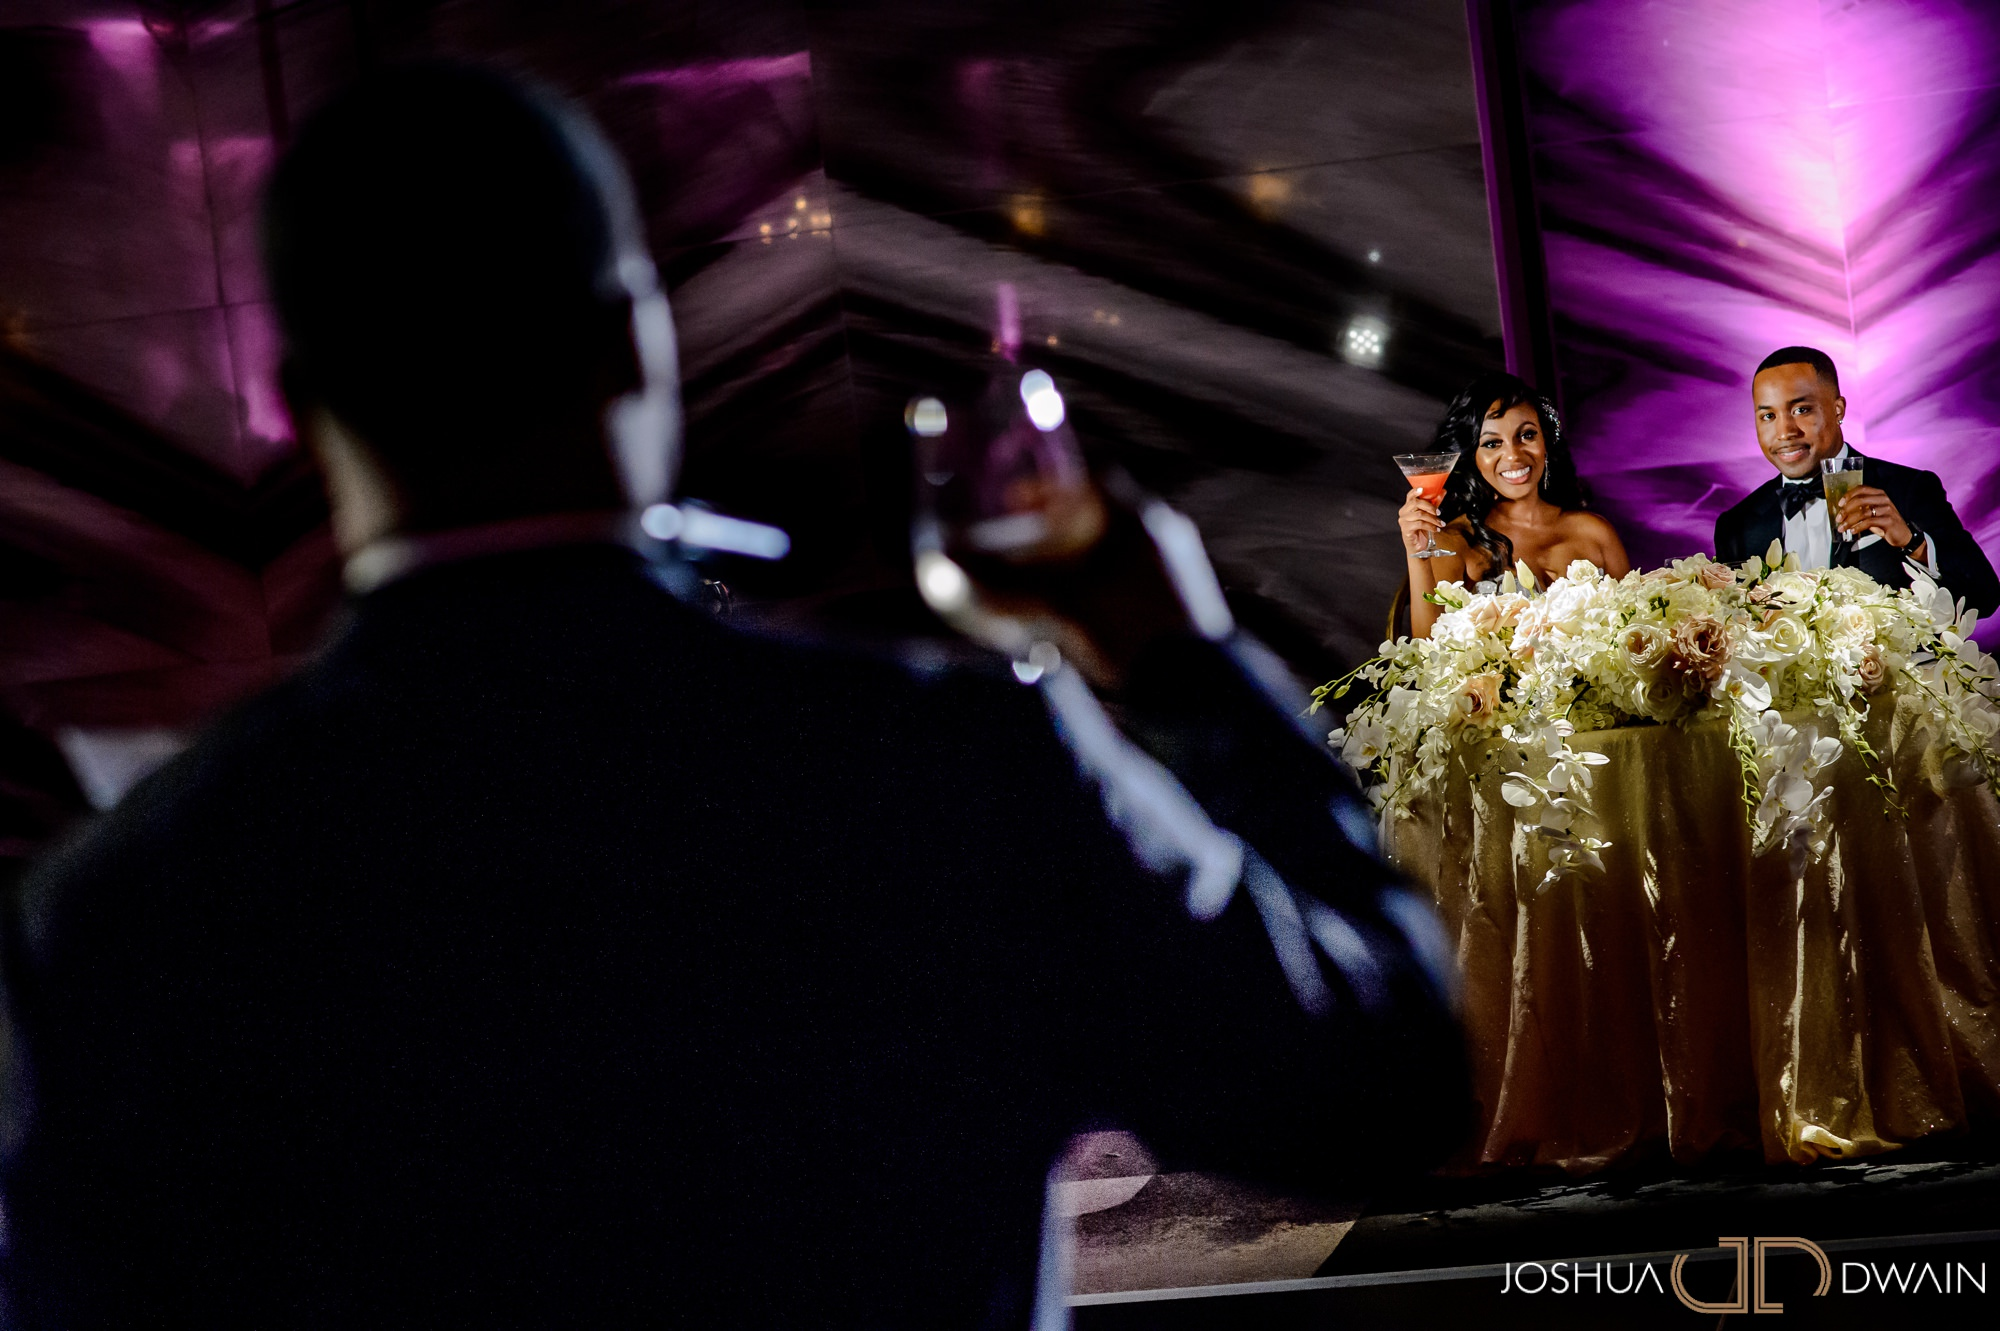 shameka-jeremy-035-watergate-hotel-washington-dc-wedding-joshua-dwain-photography.jpg